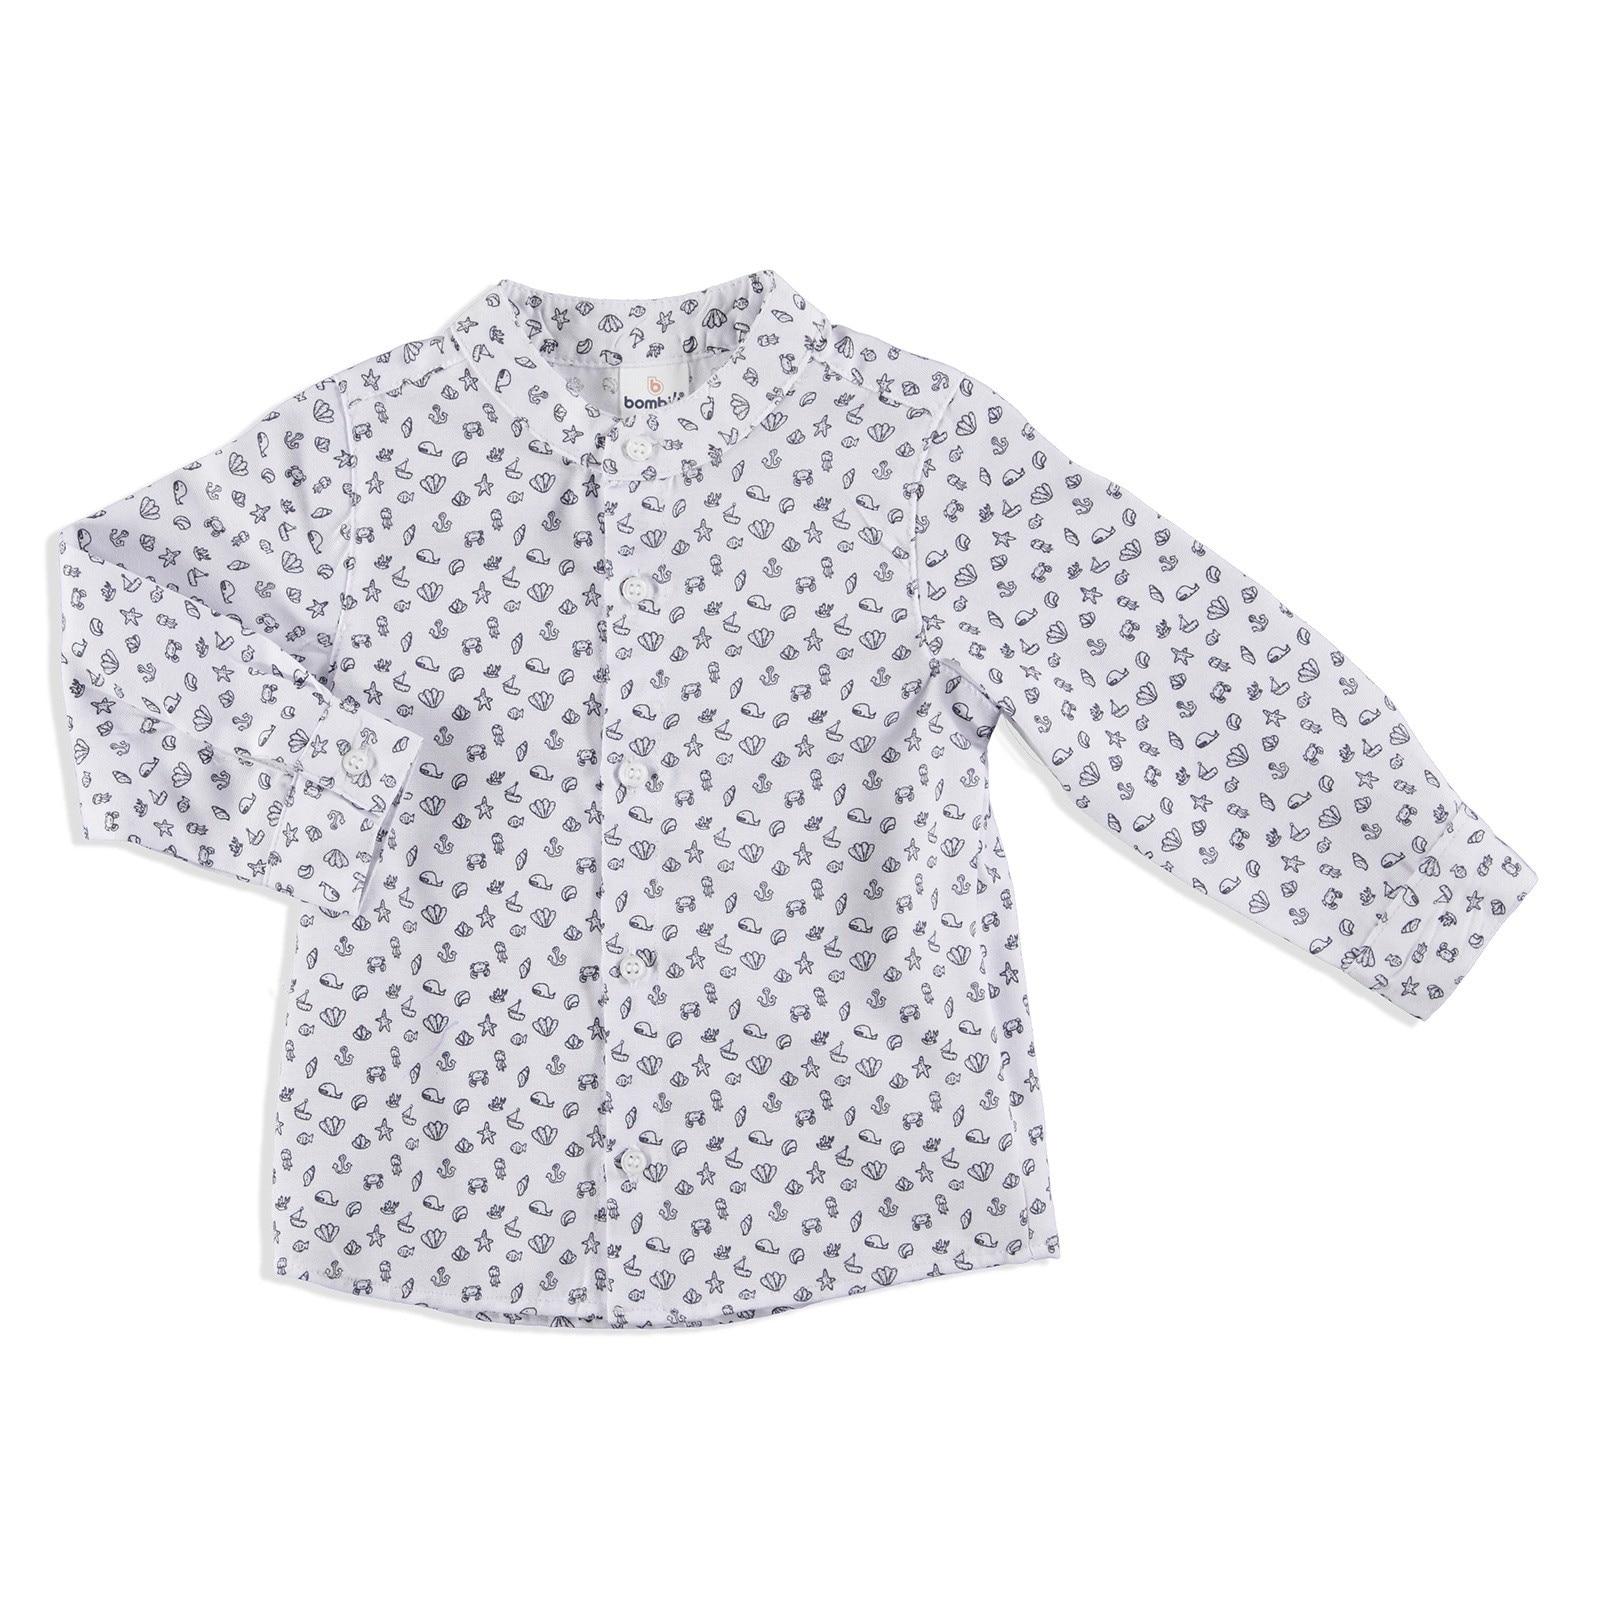 Ebebek Bombili Winter Summer Printed Baby Boy Judge Collar Shirt